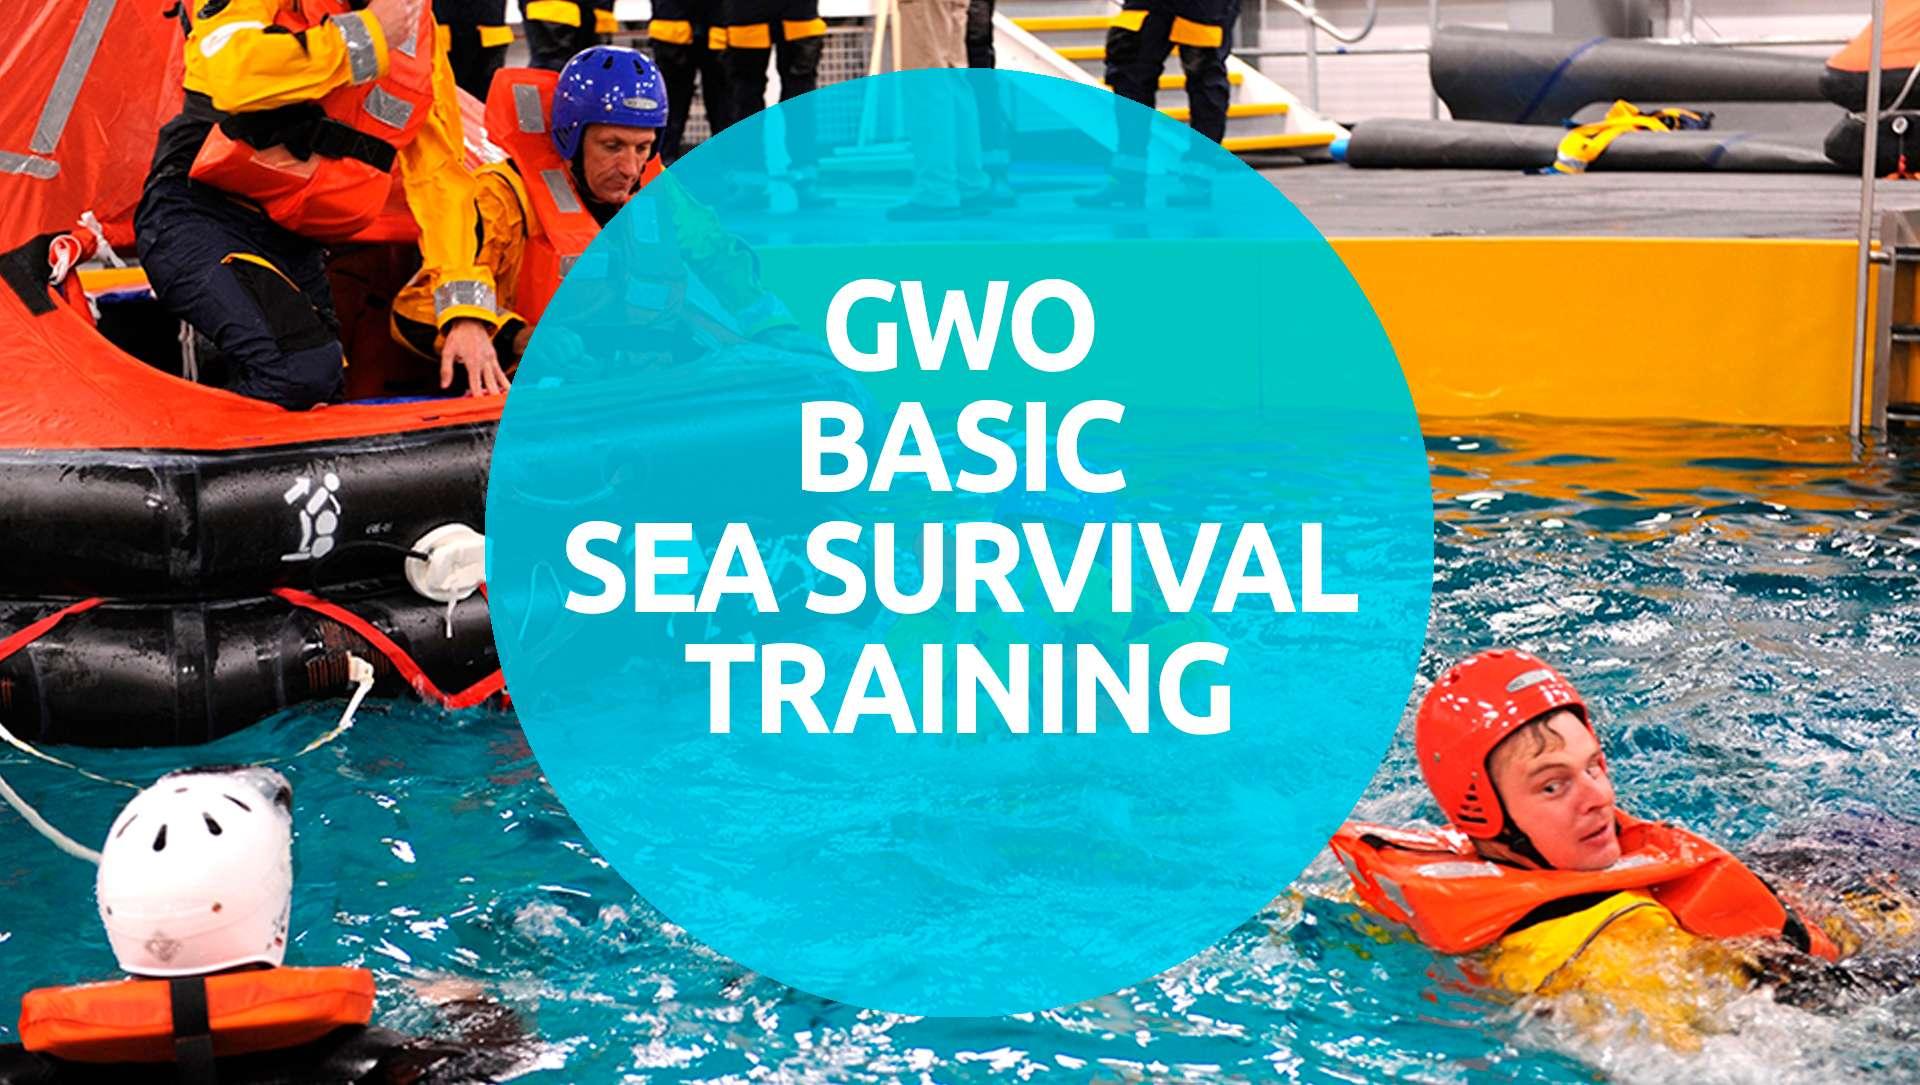 GWO-Basic-Sea-Survival-Training